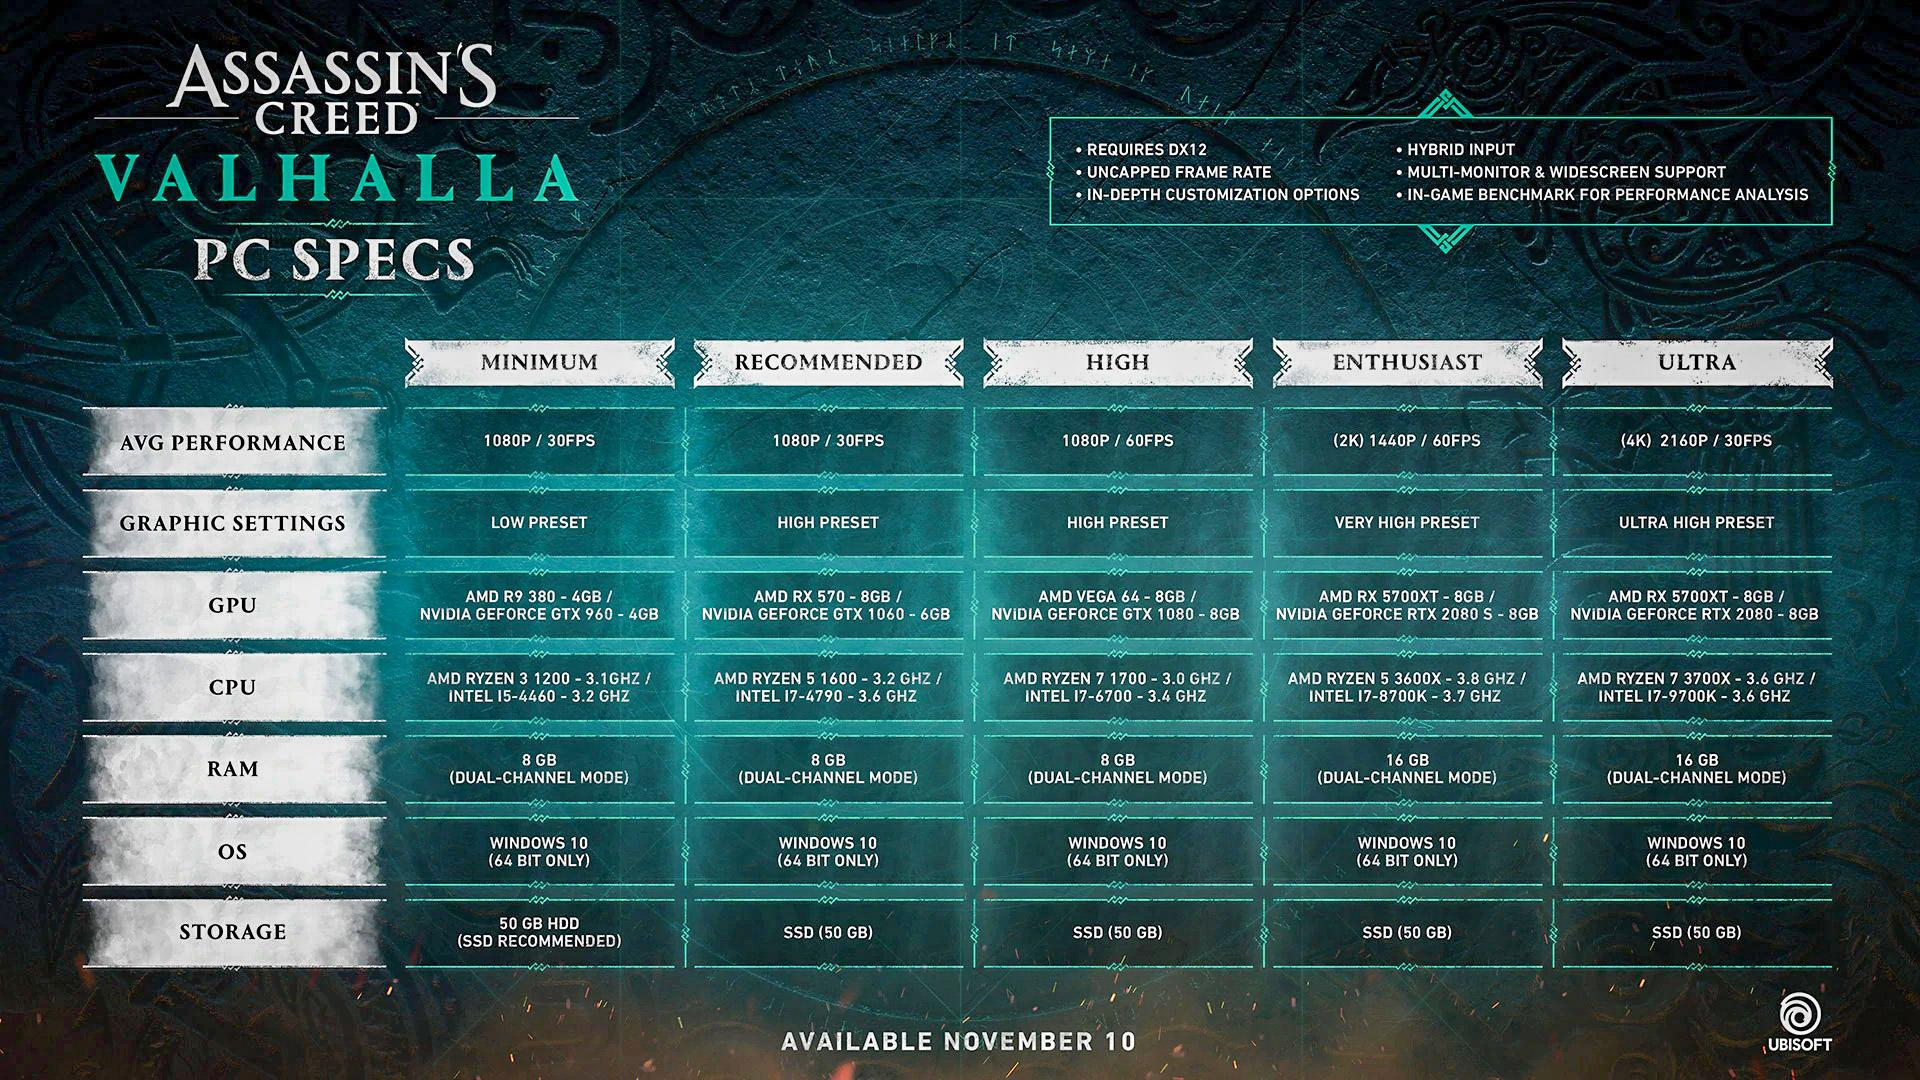 Assassin's Creed Valhalla: PC-Wikinger benötigen DirectX-12-kompatible Grafikkarte - PC-Spezifikationen von Assassin's Creed Valhalla (Bild: Ubisoft)